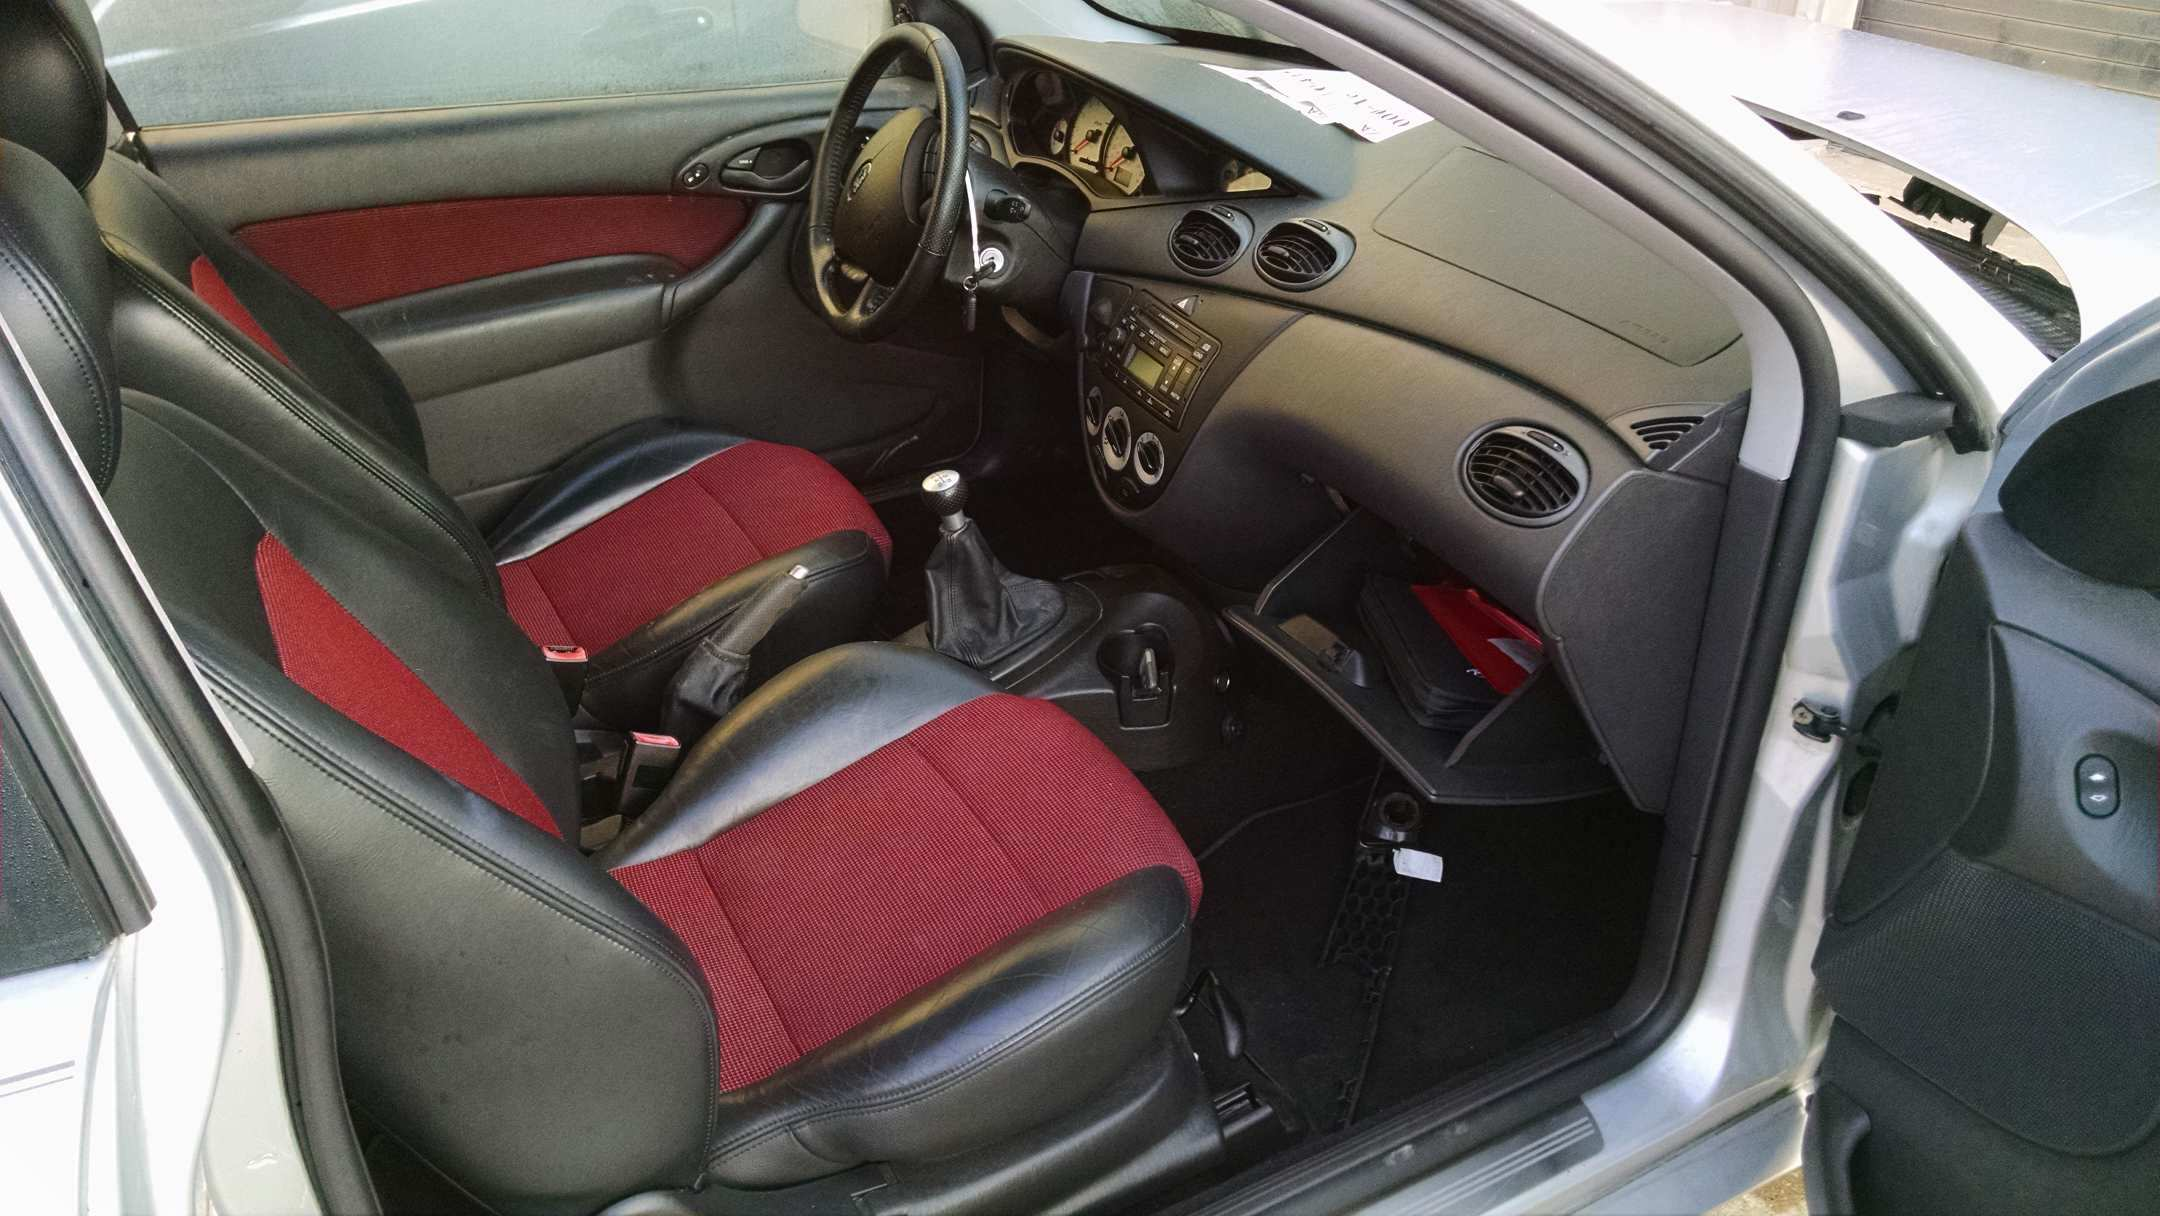 of ford image blog update interior download car parts ranger